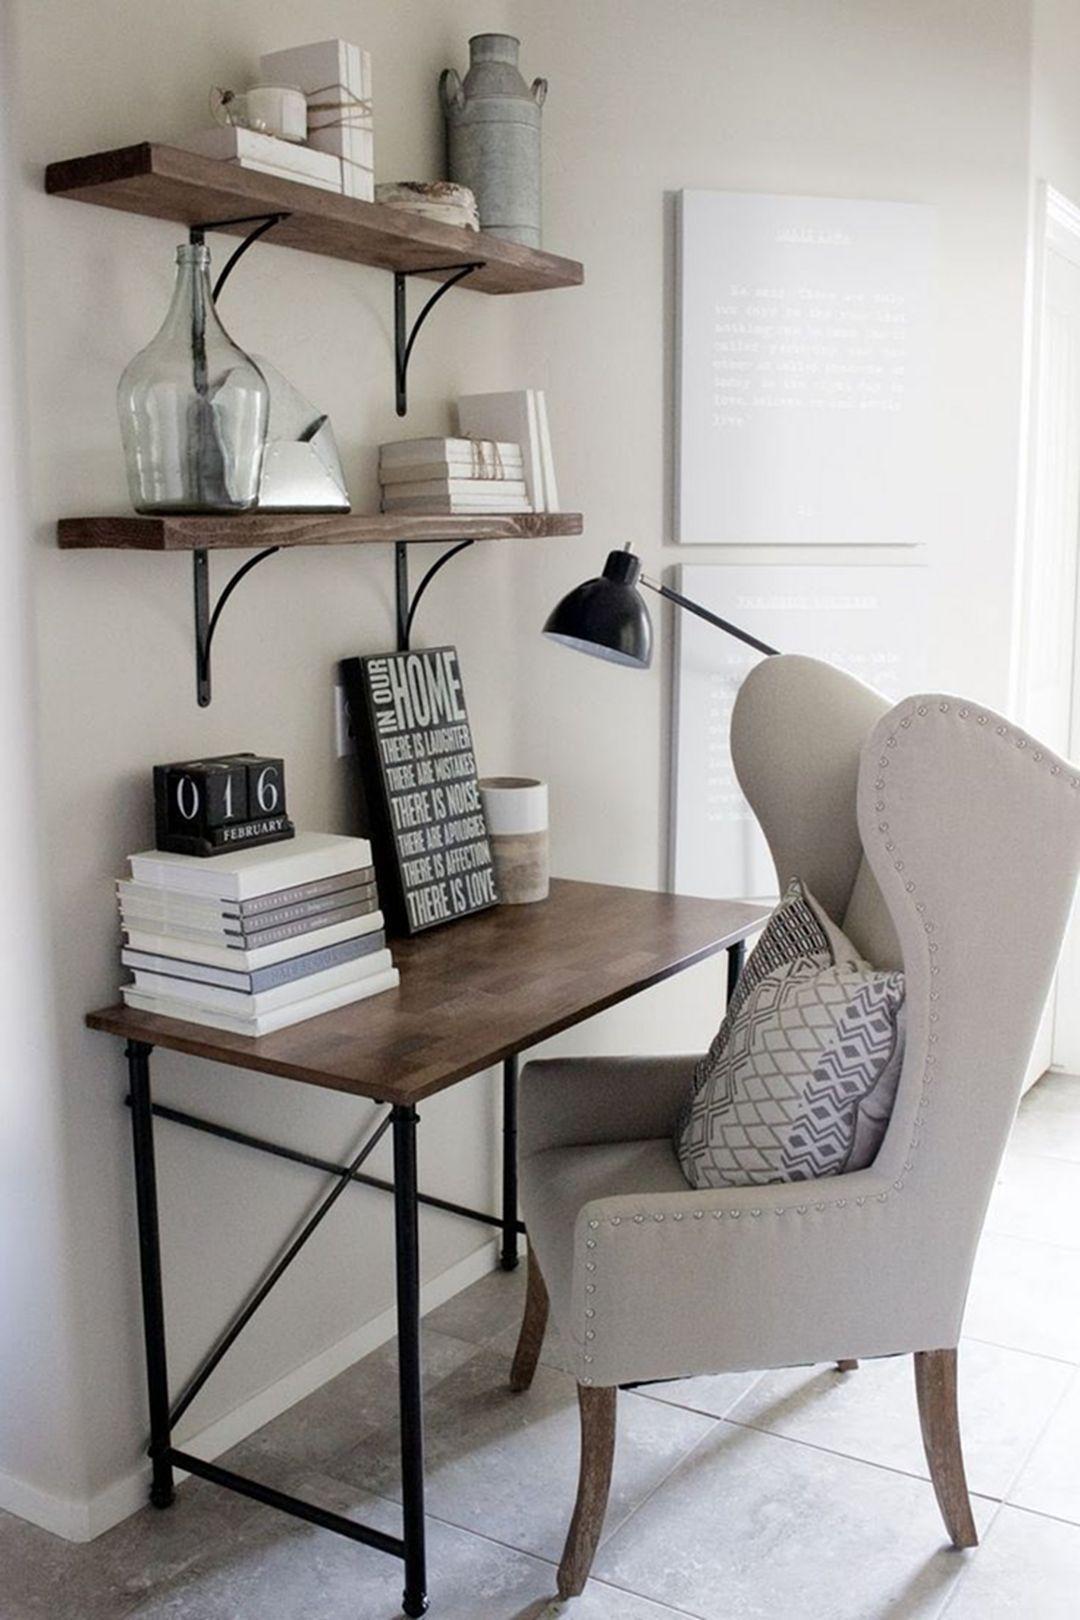 15 Fantastic Small Bedroom Desk Designs For Small Bedroom Ideas Decor It S Home Office Furniture Home Office Decor Small Bedroom Desk